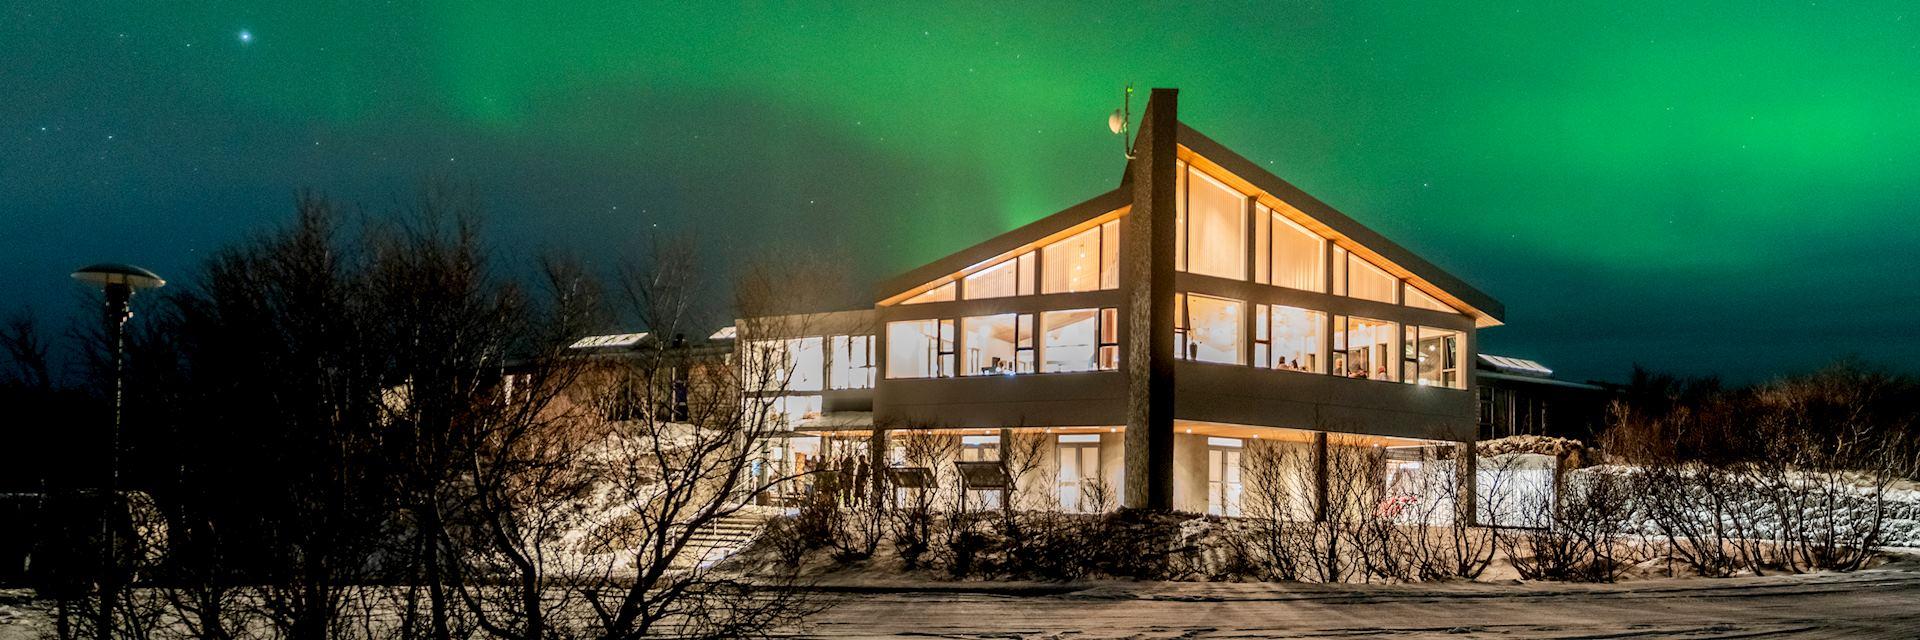 Hotel Husafell, Iceland